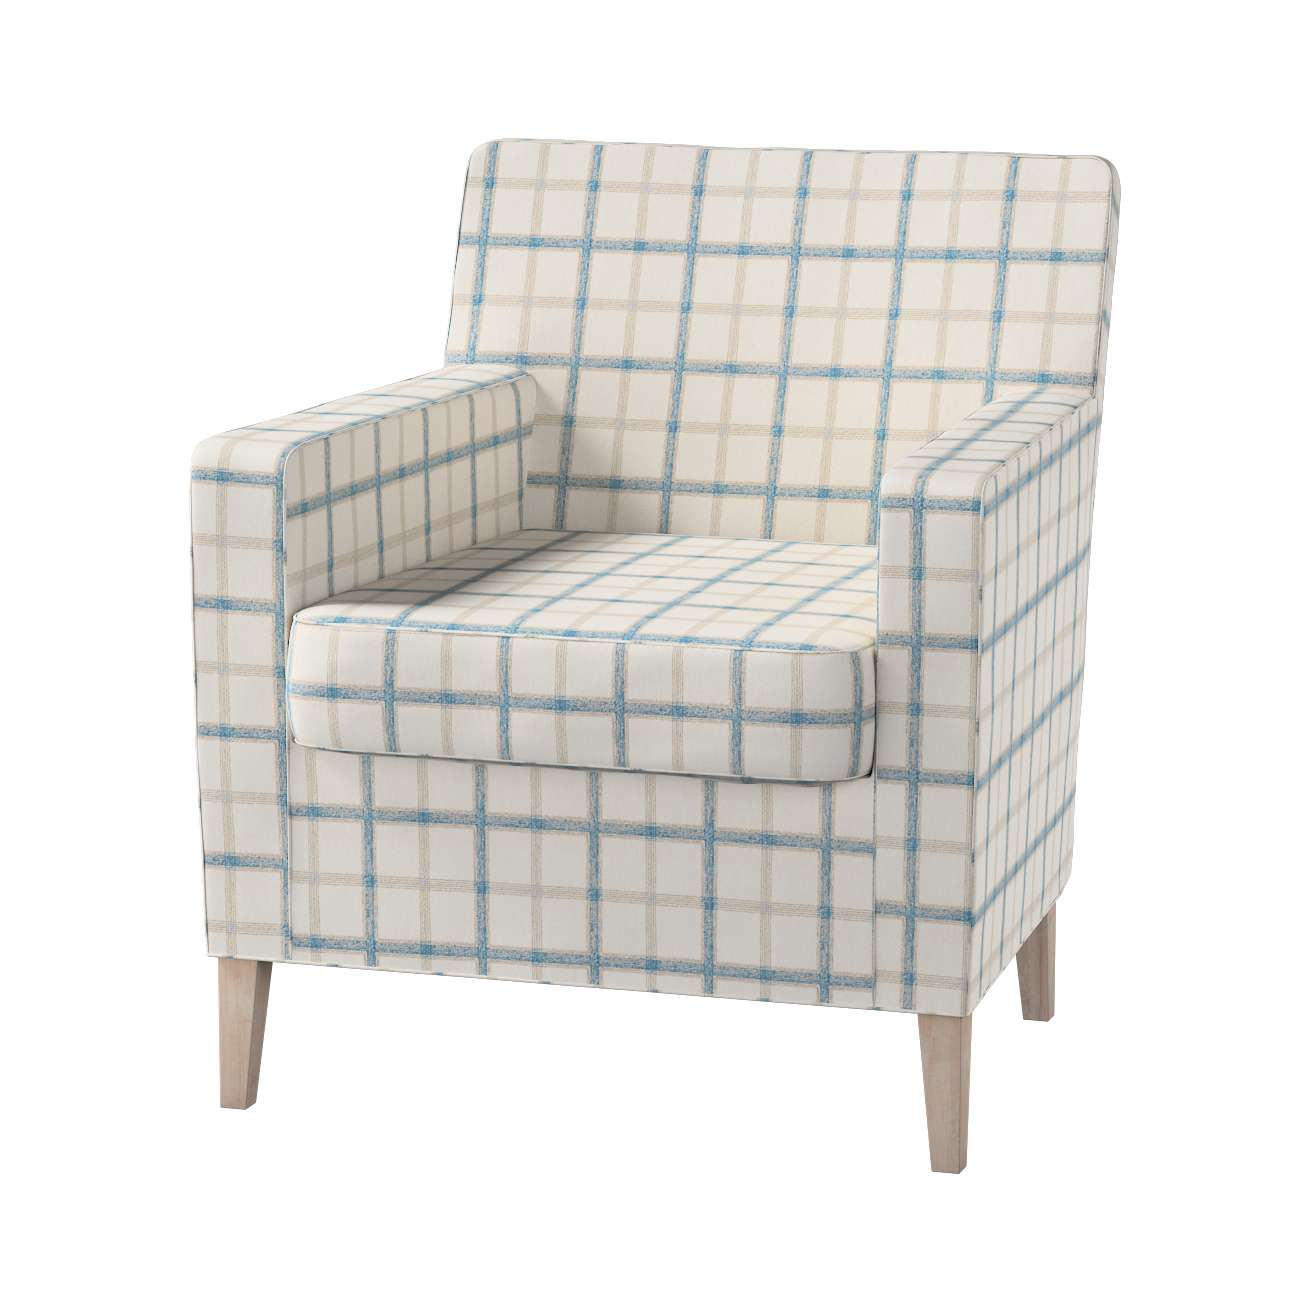 Pokrowiec na fotel Karlstad Fotel  Karlstad w kolekcji Avinon, tkanina: 131-66